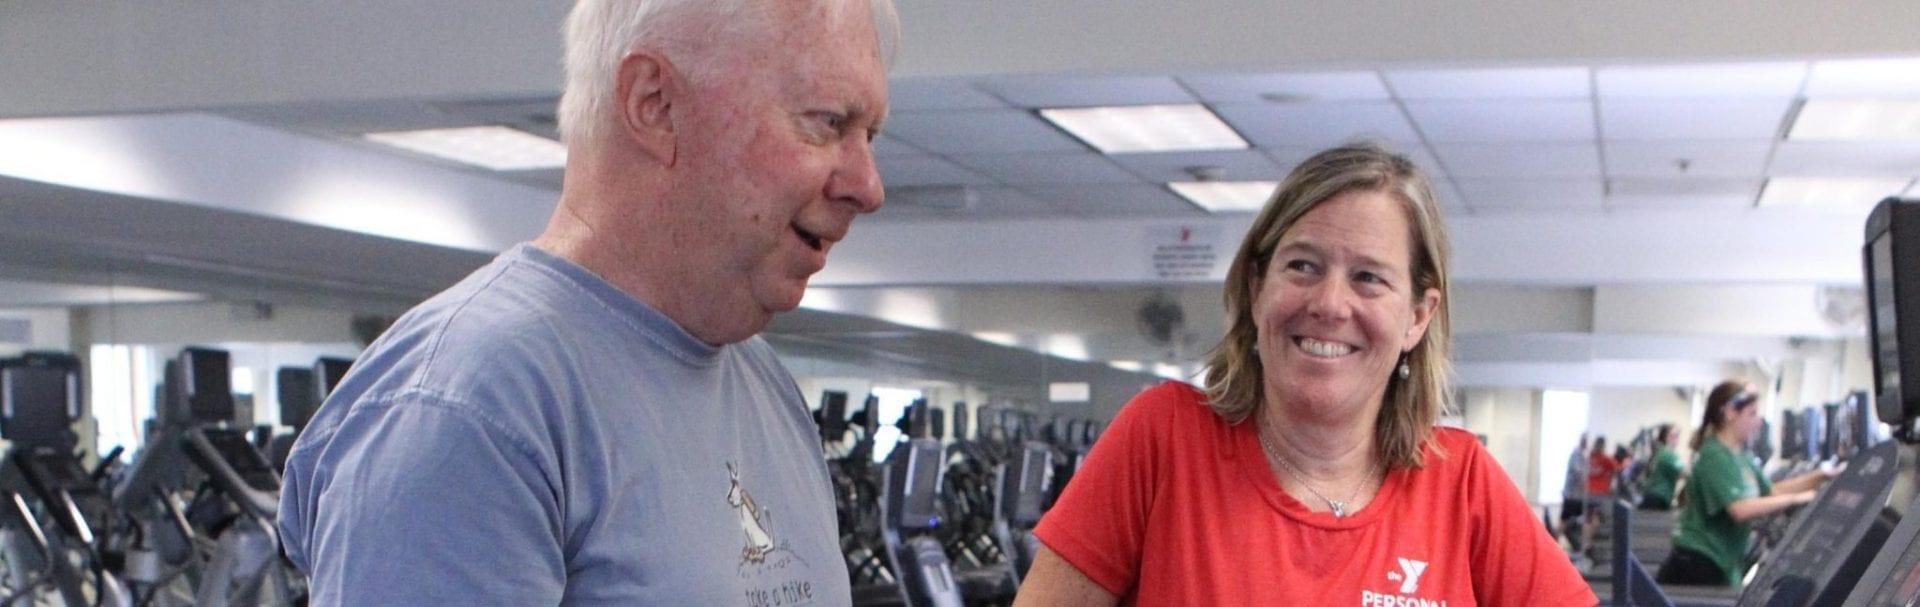 Membership Categories & Rates | Westfield Area YMCA